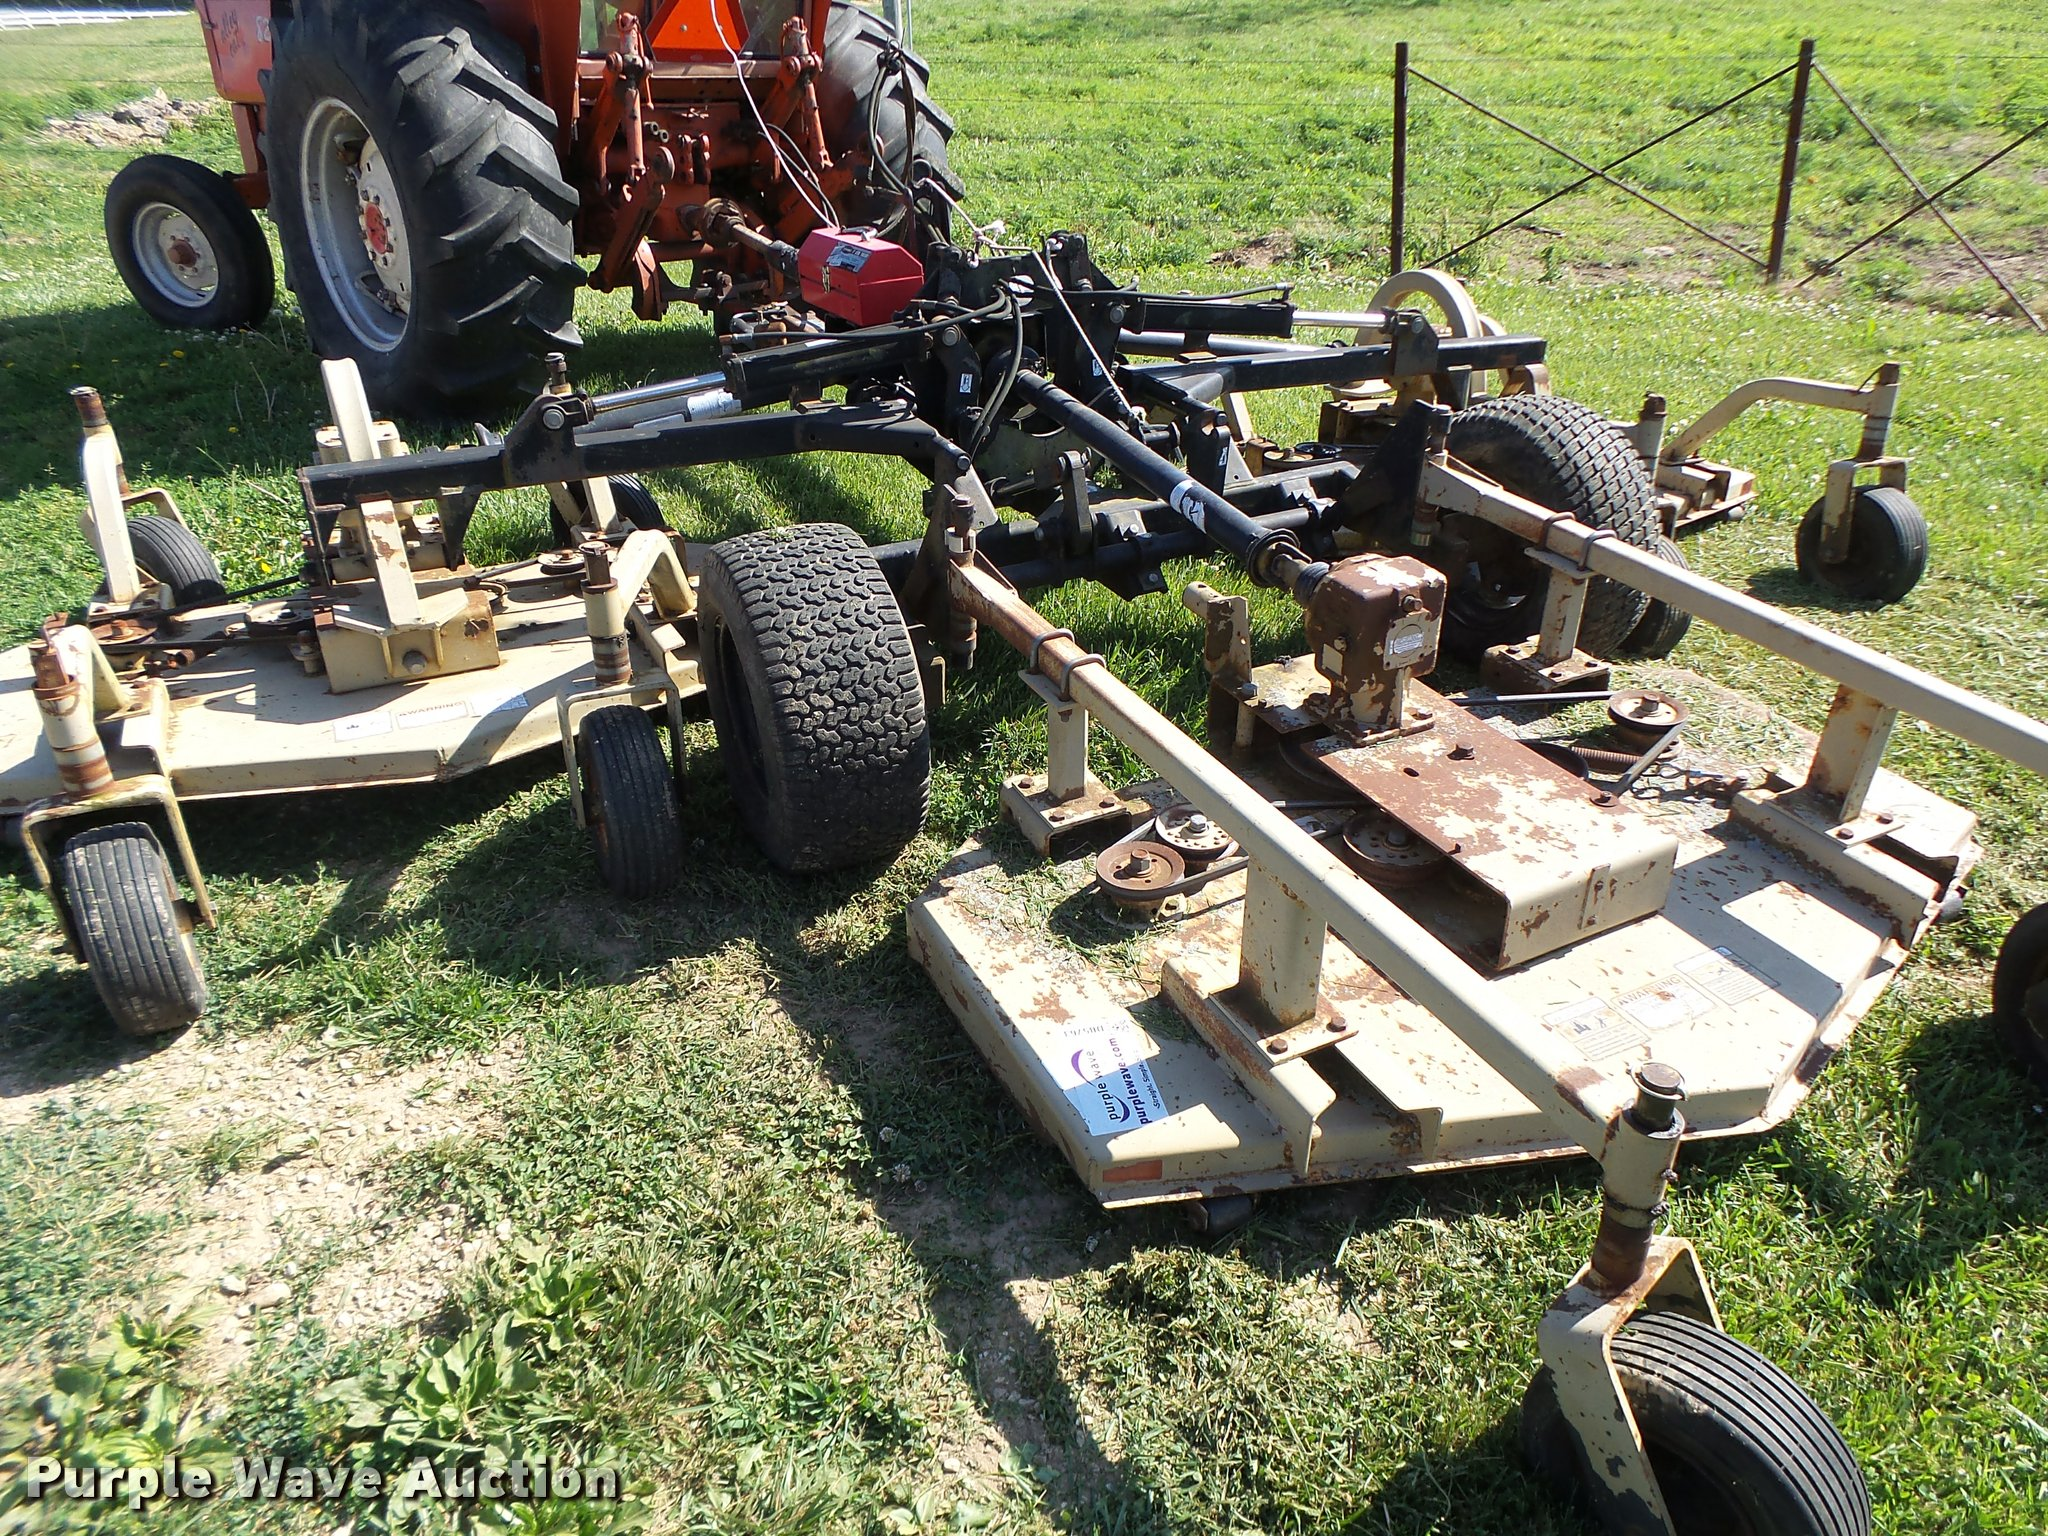 Land Pride AFM40168 batwing finish mower | Item DB5763 | SOL